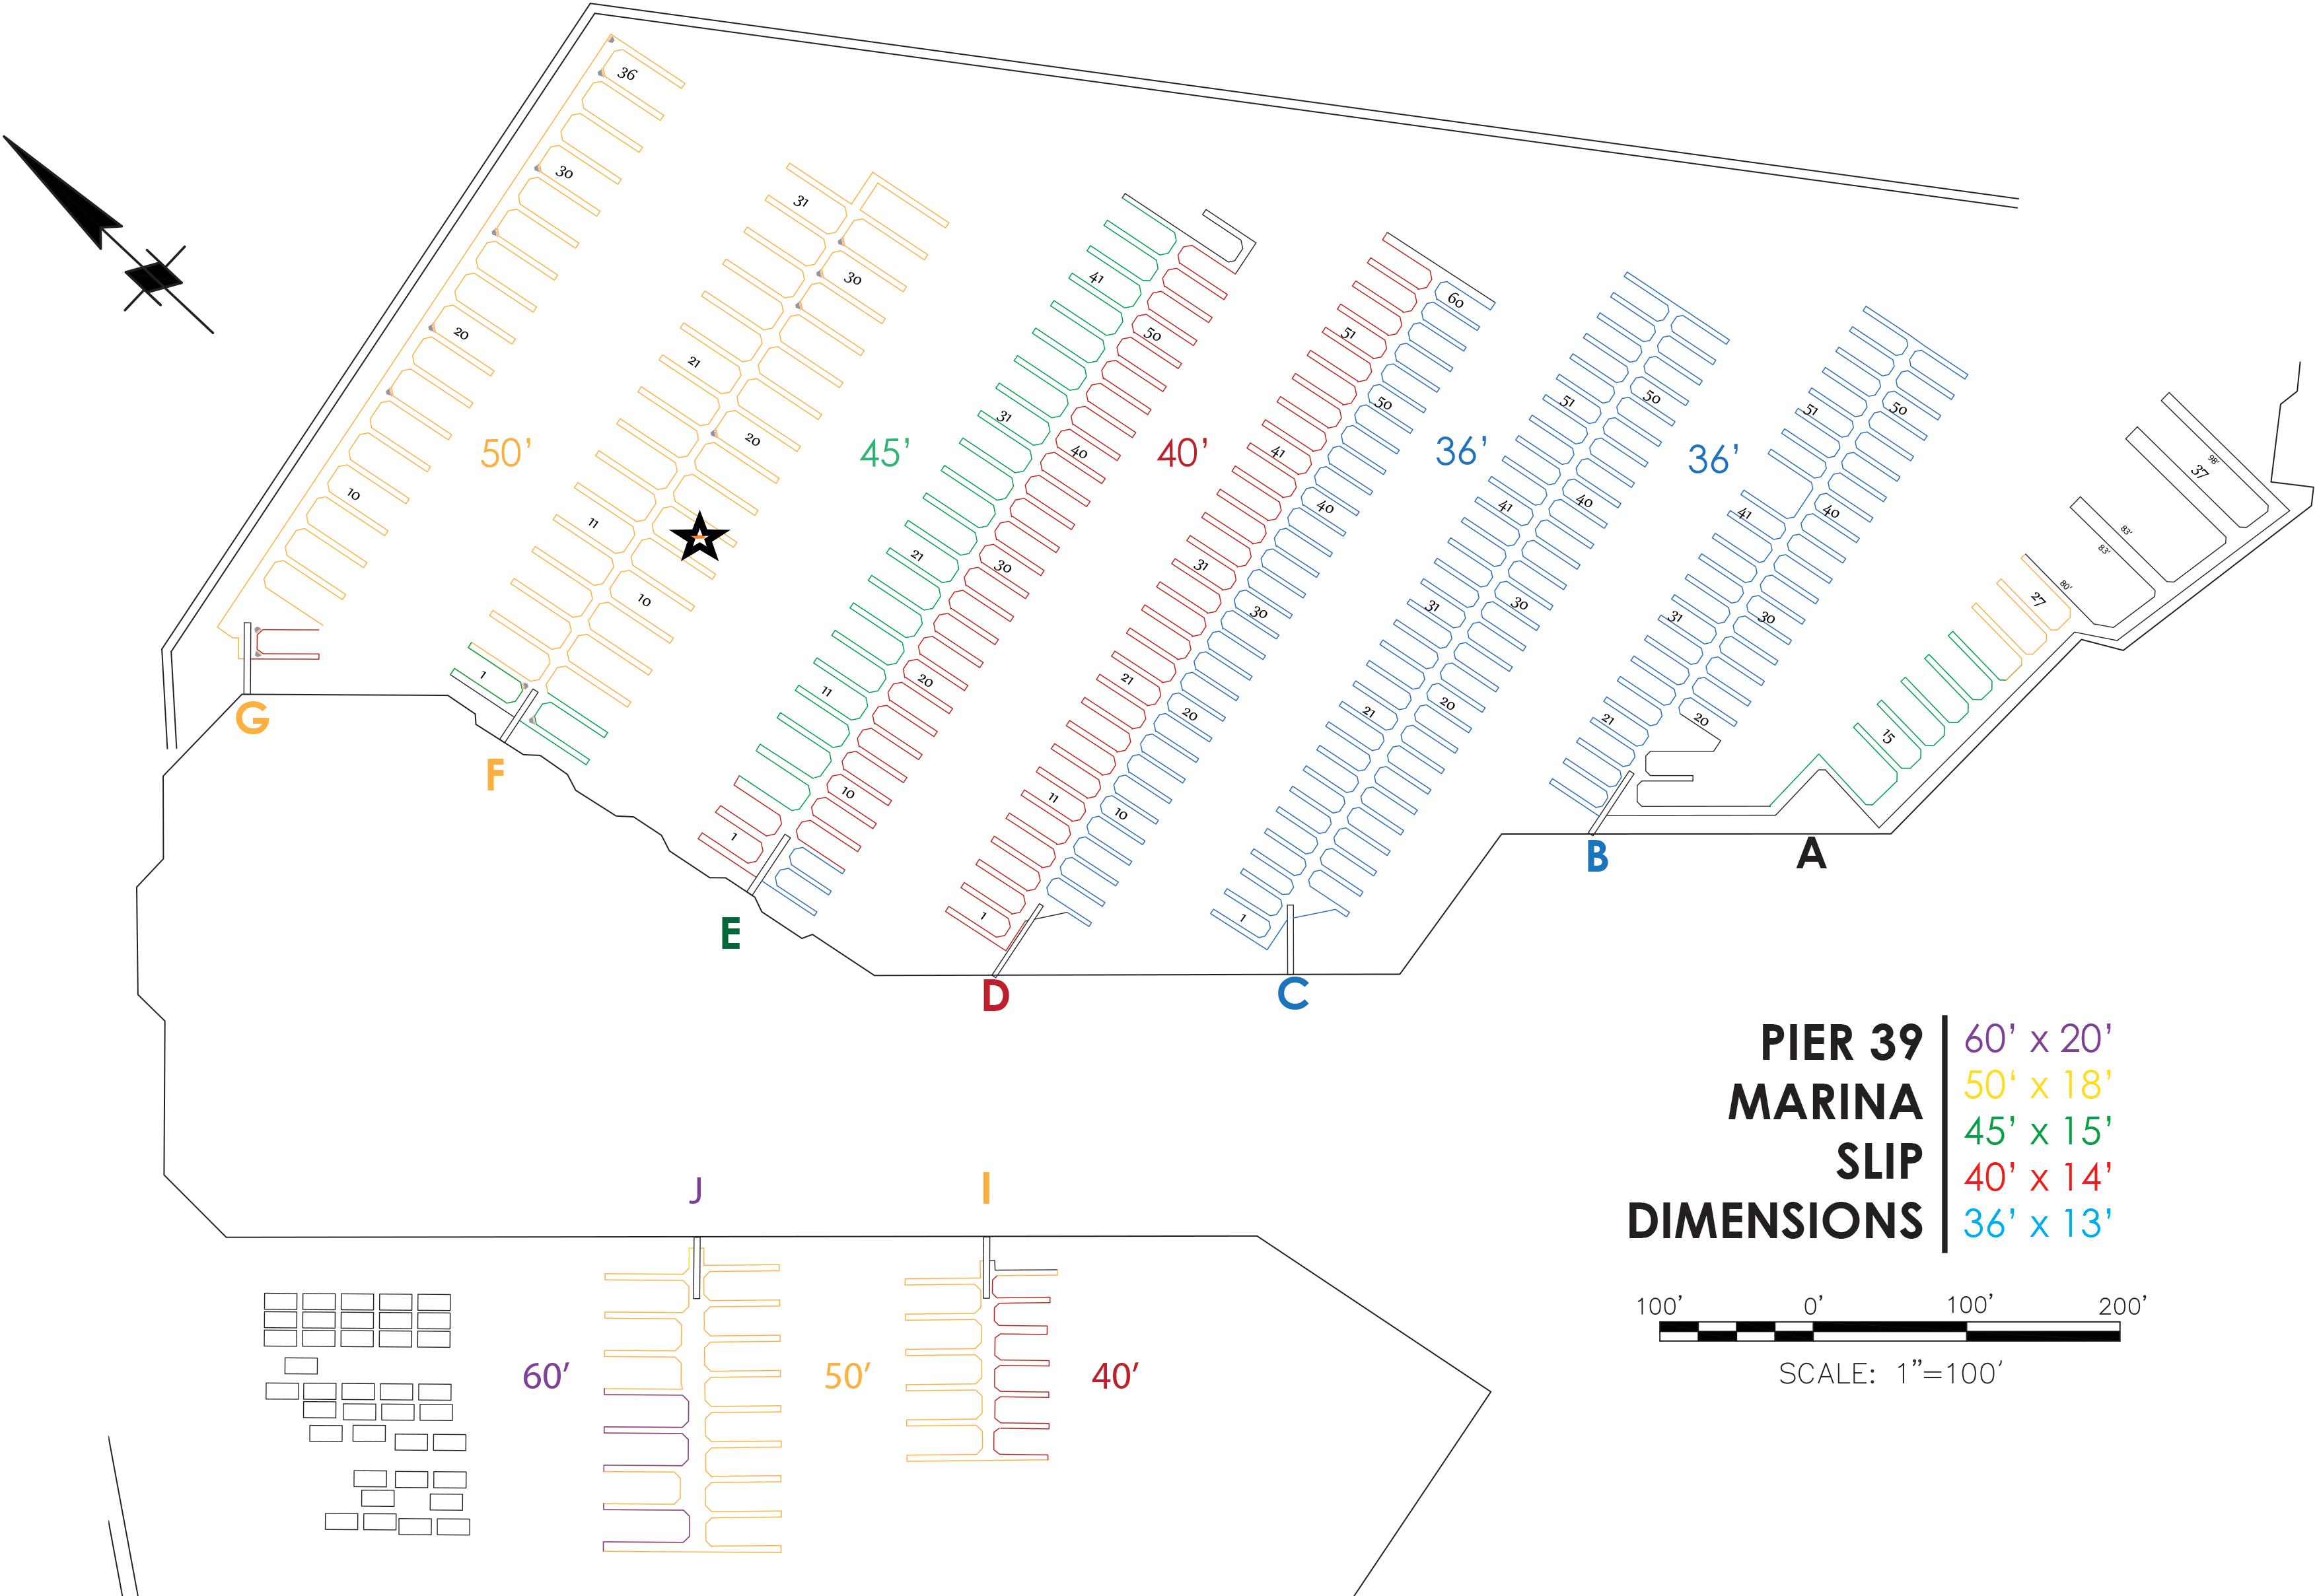 Color Coded Map Marina 2018 Dockbox